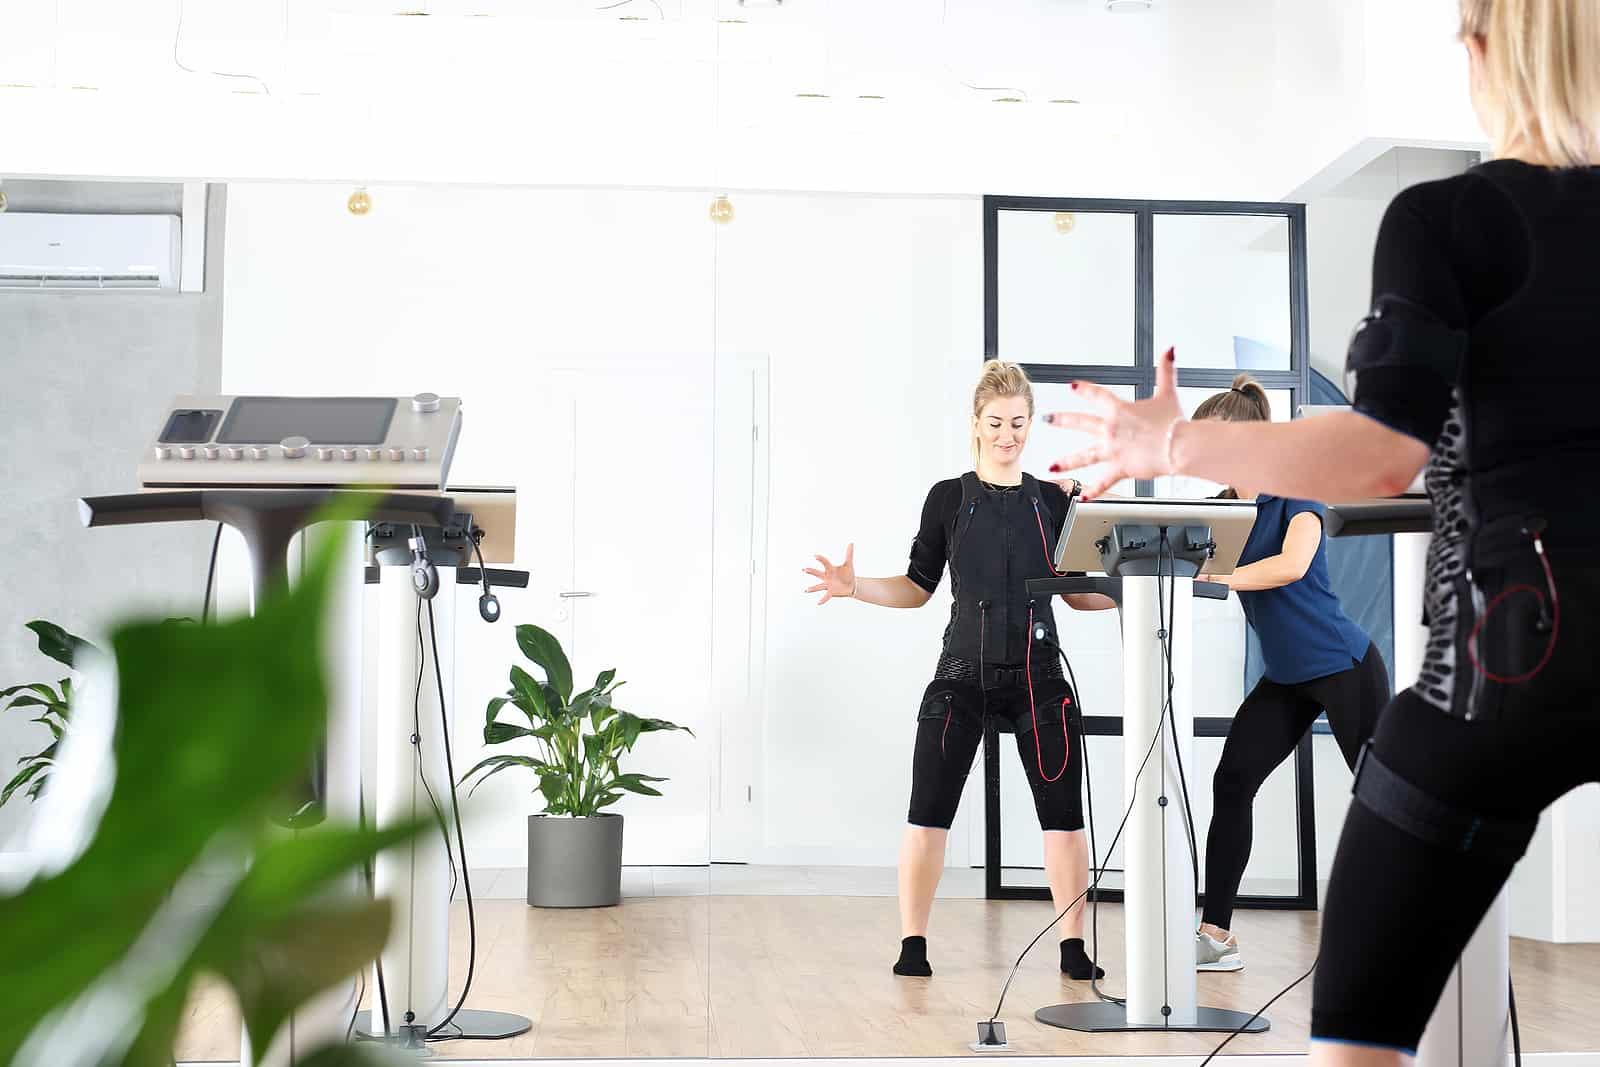 Traditional Cardio Vs. Metabolic Resistance Training